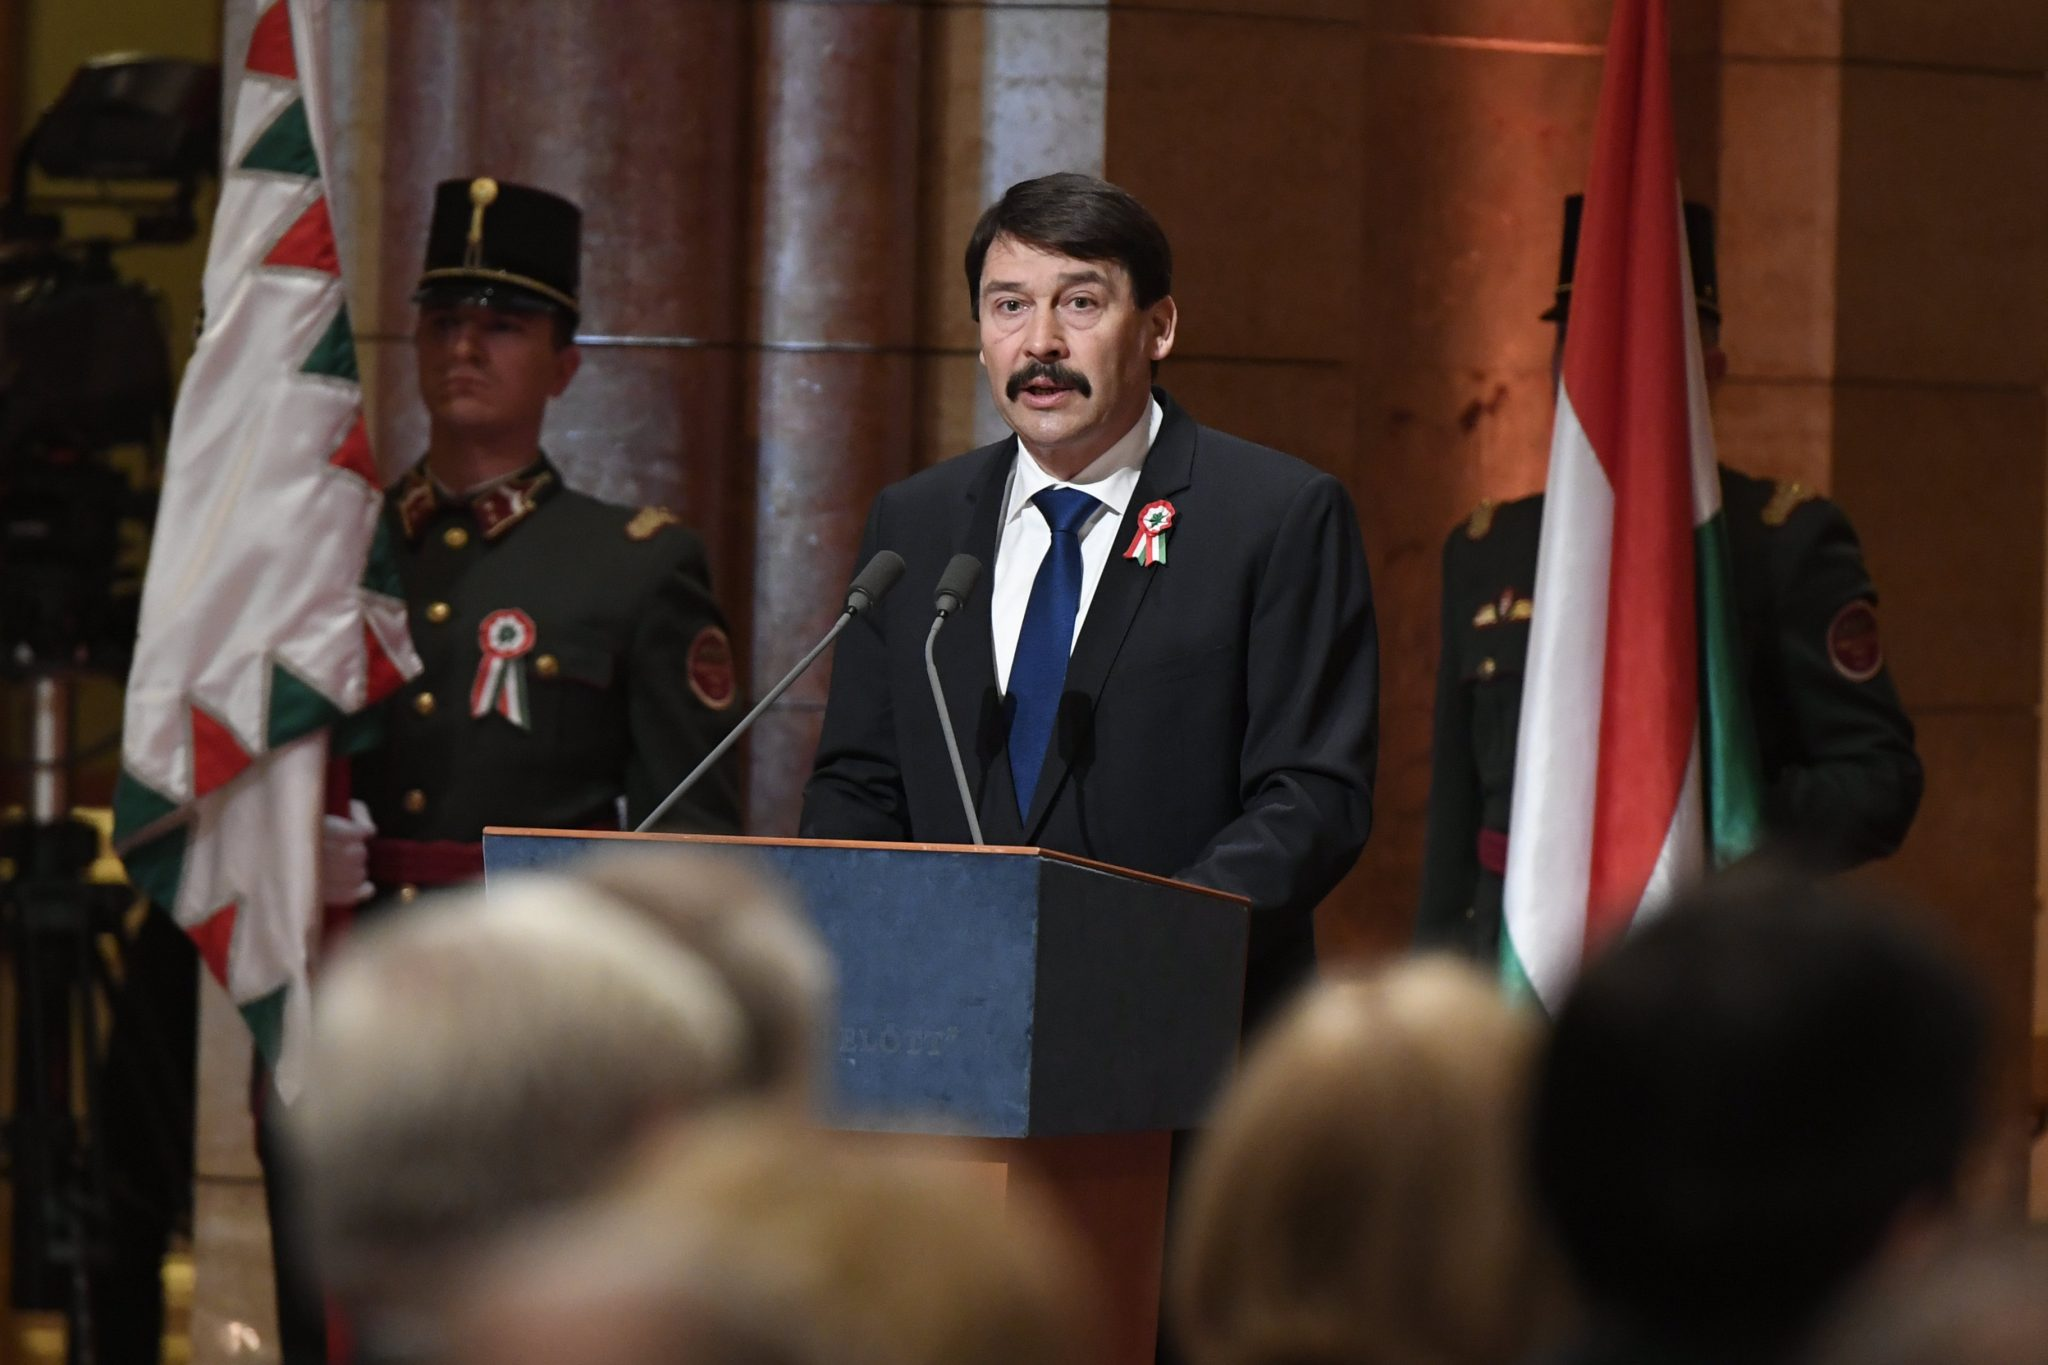 March 15: President Áder Urges Unity 'Against Common Enemy' Coronavirus